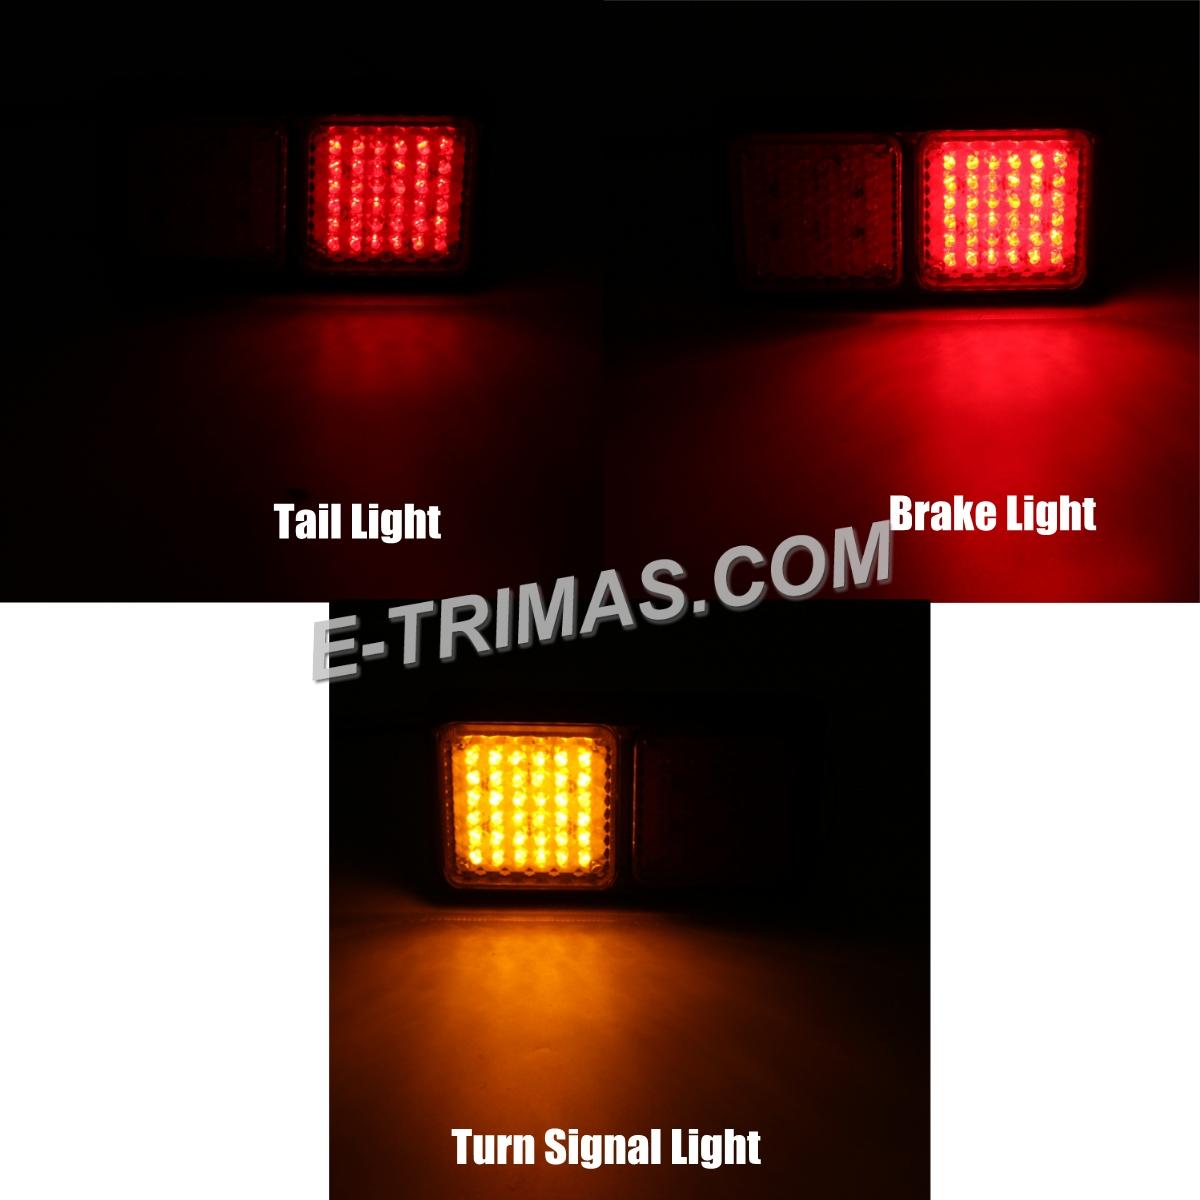 72LED Tail Light Lamp Brake Turn Signal Indicator Trailer Truck UTE Lorry 24V (1PC)